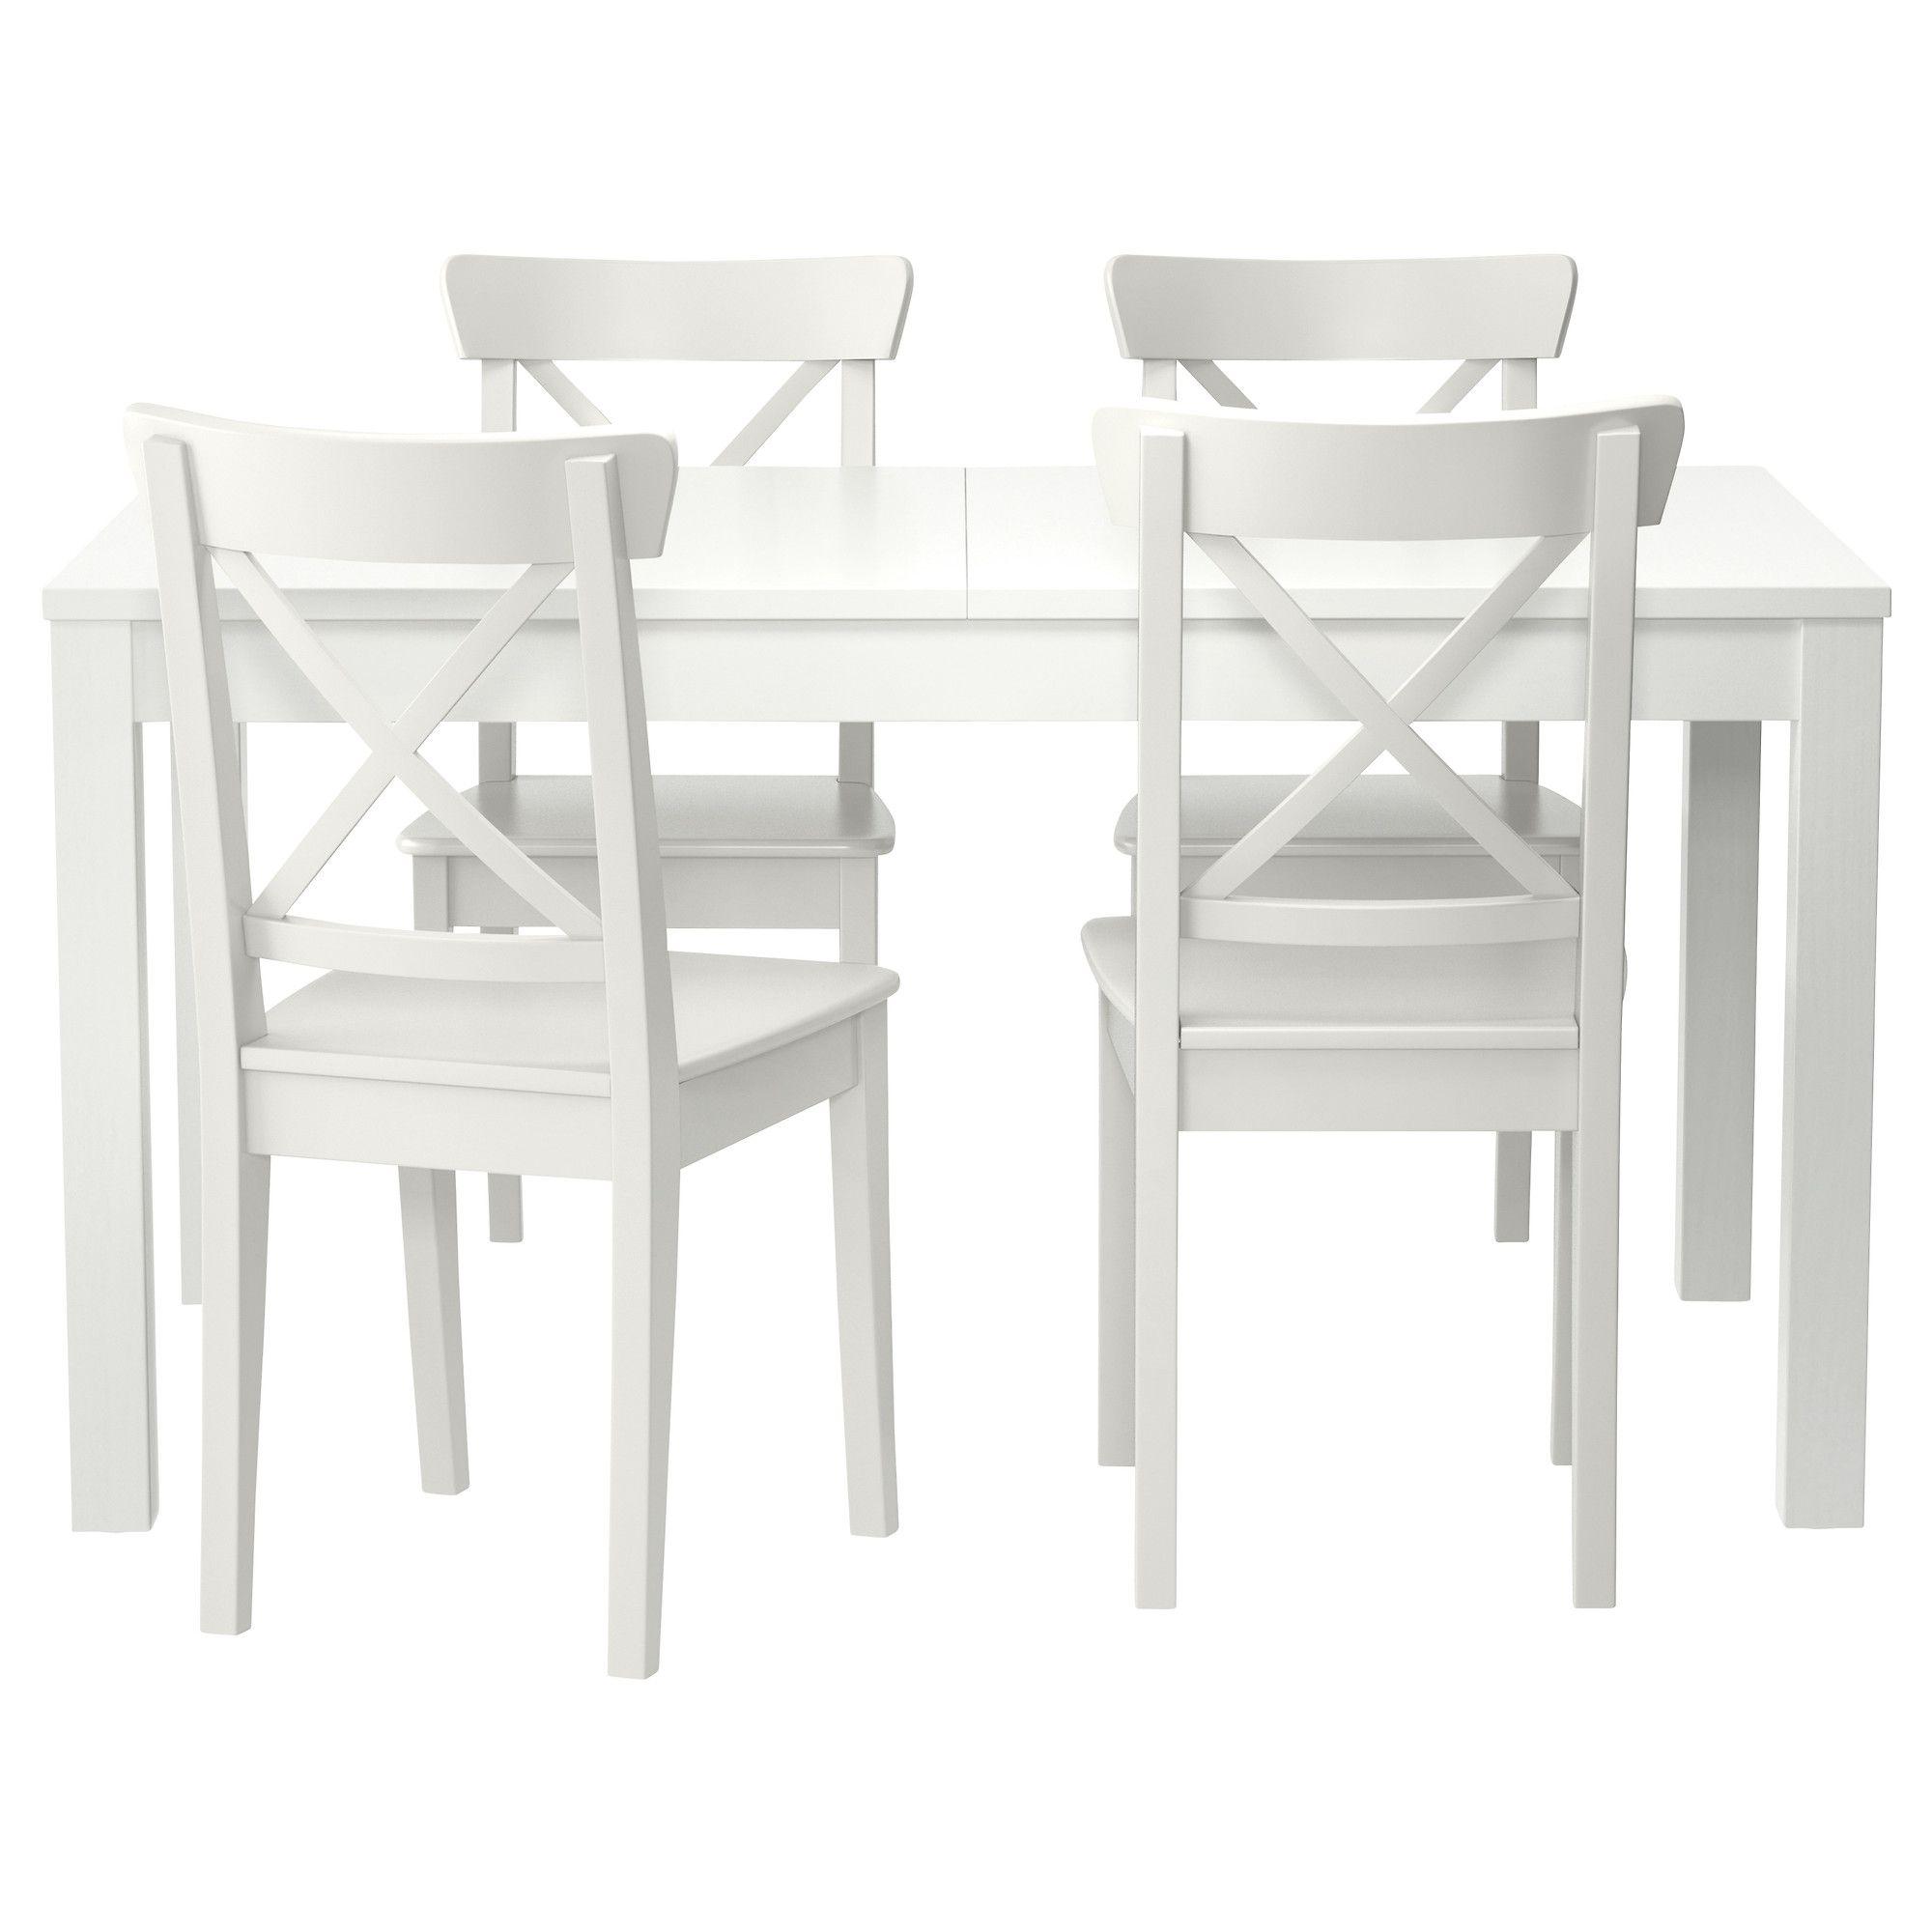 Tavolo Ikea Bjursta Bianco.Shop For Furniture Lighting Home Accessories More Ikea